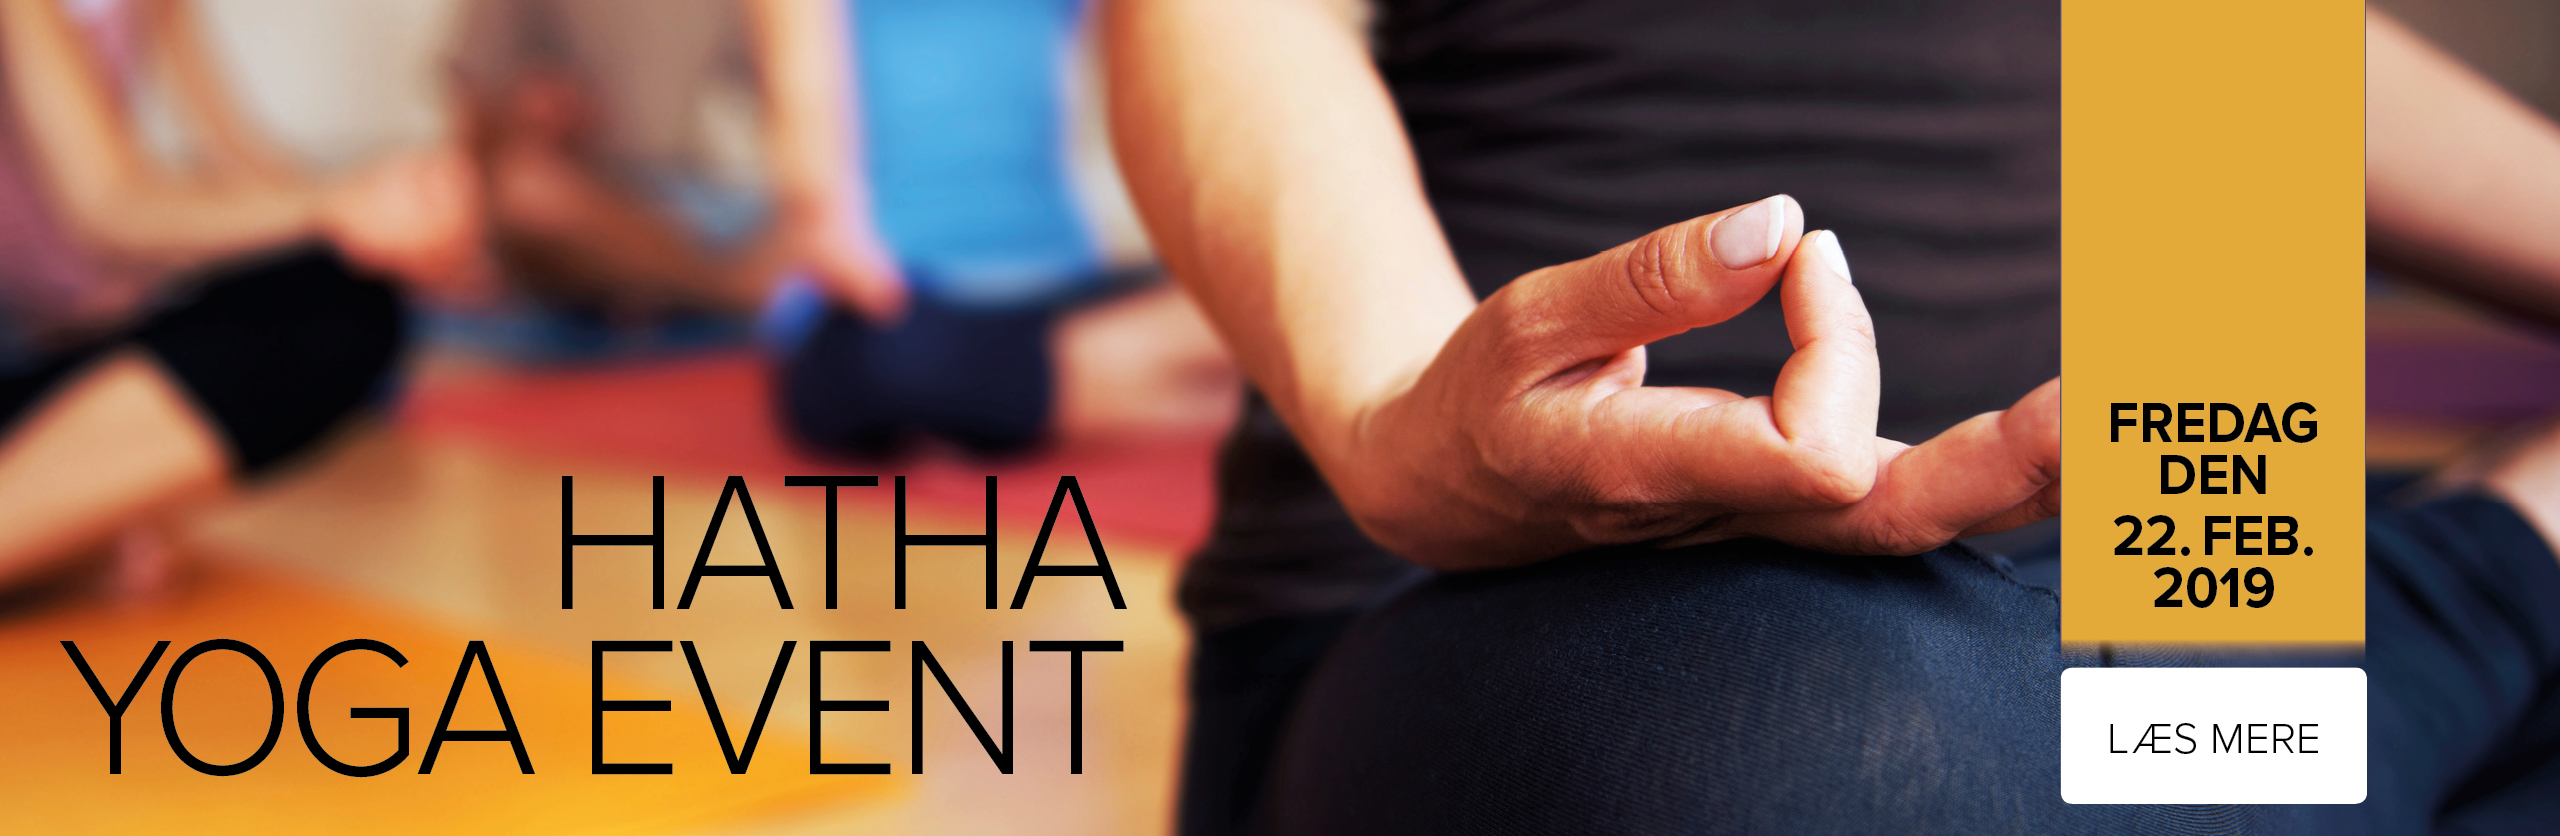 HATHA yoga event feb. 2019